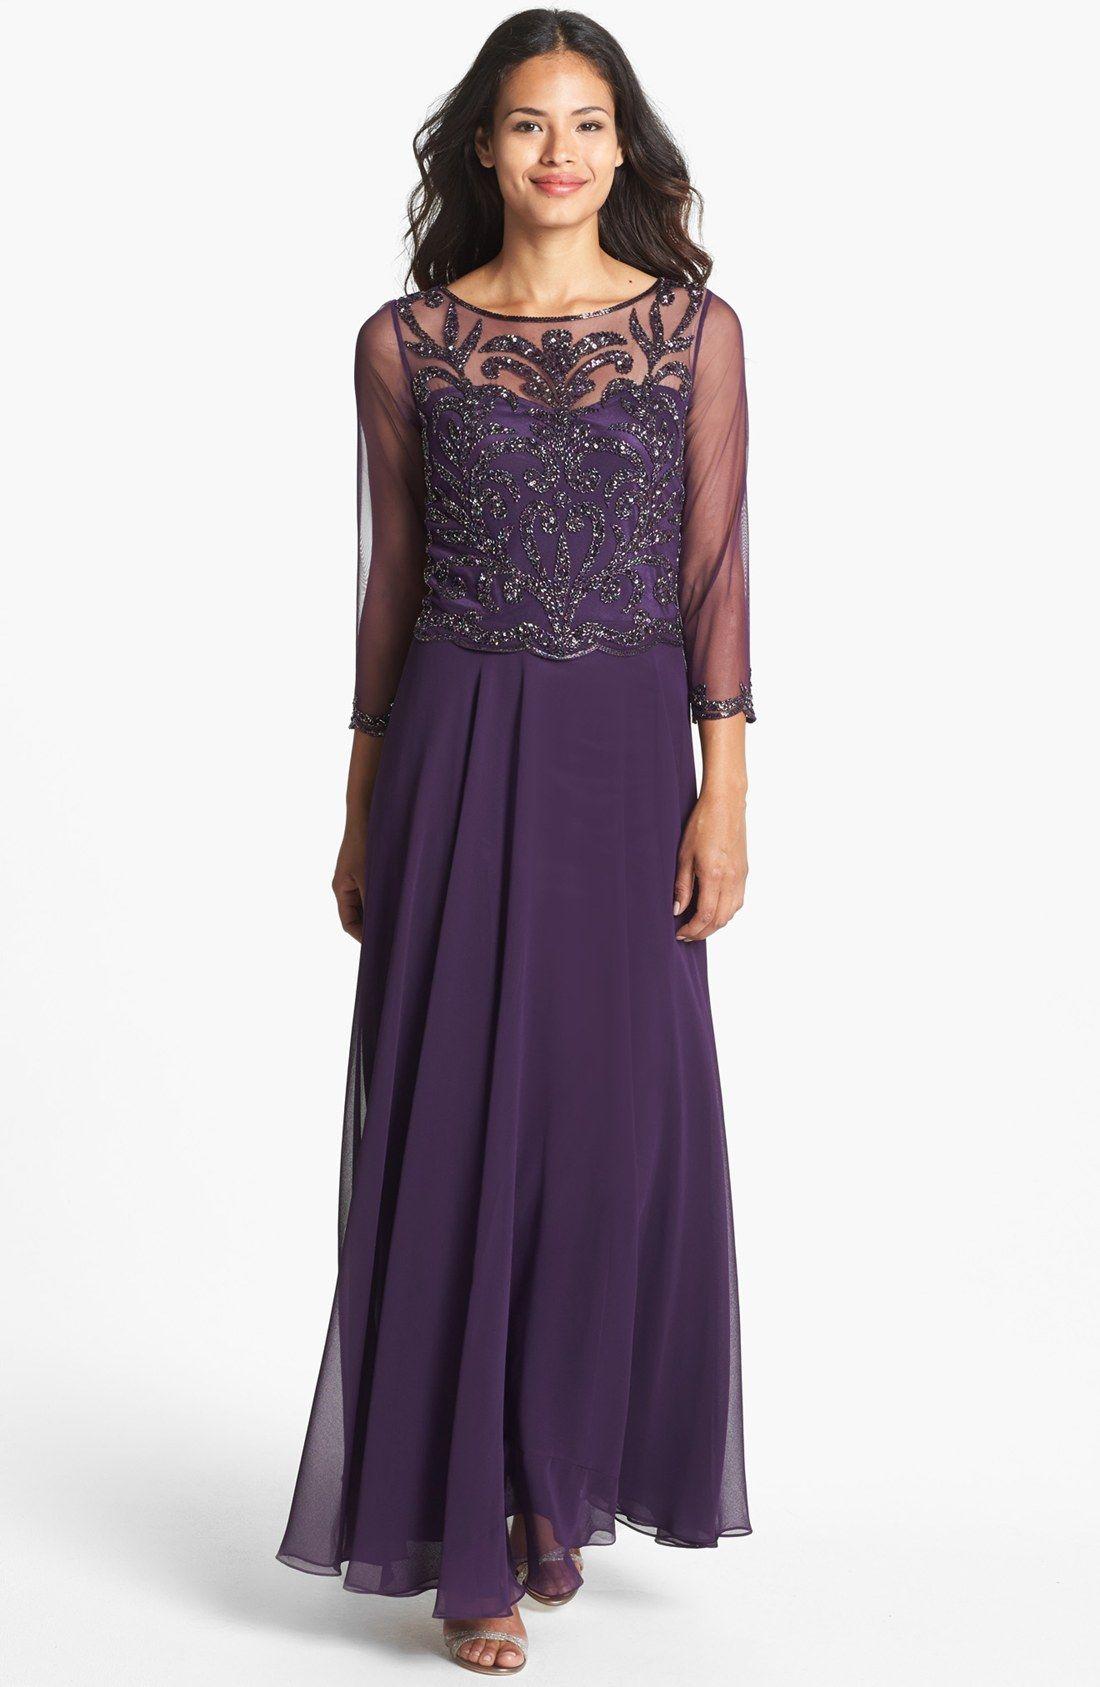 J Kara Beaded Bodice Mesh Gown | Mother of the Bride Dresses | Pinterest